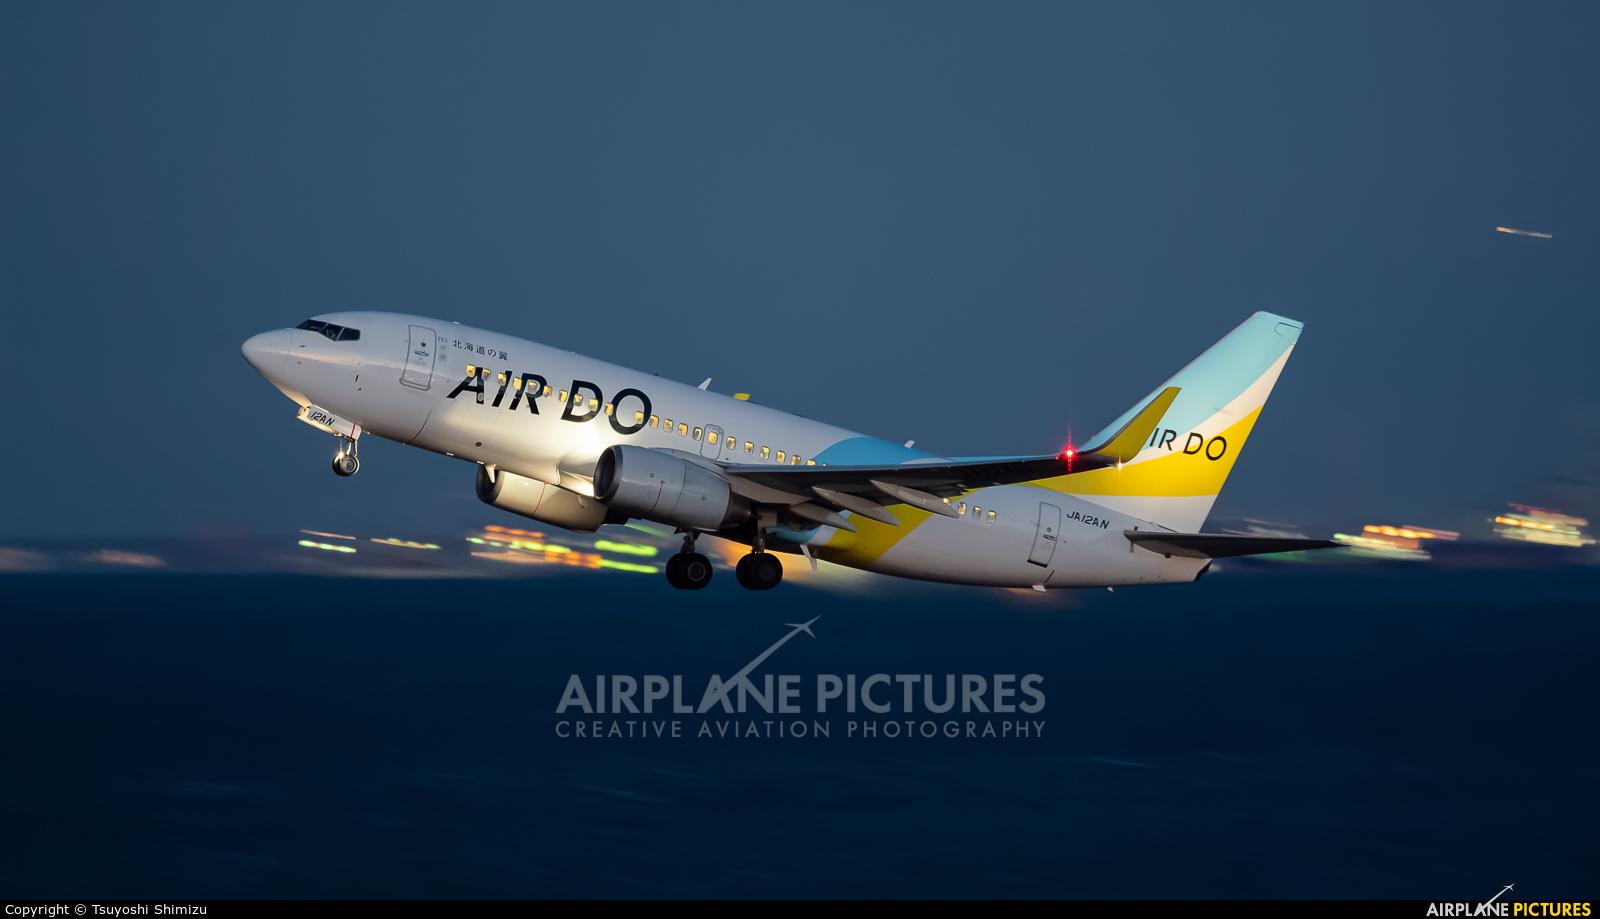 Air Do - Hokkaido International Airlines JA12AN aircraft at Tokyo - Haneda Intl